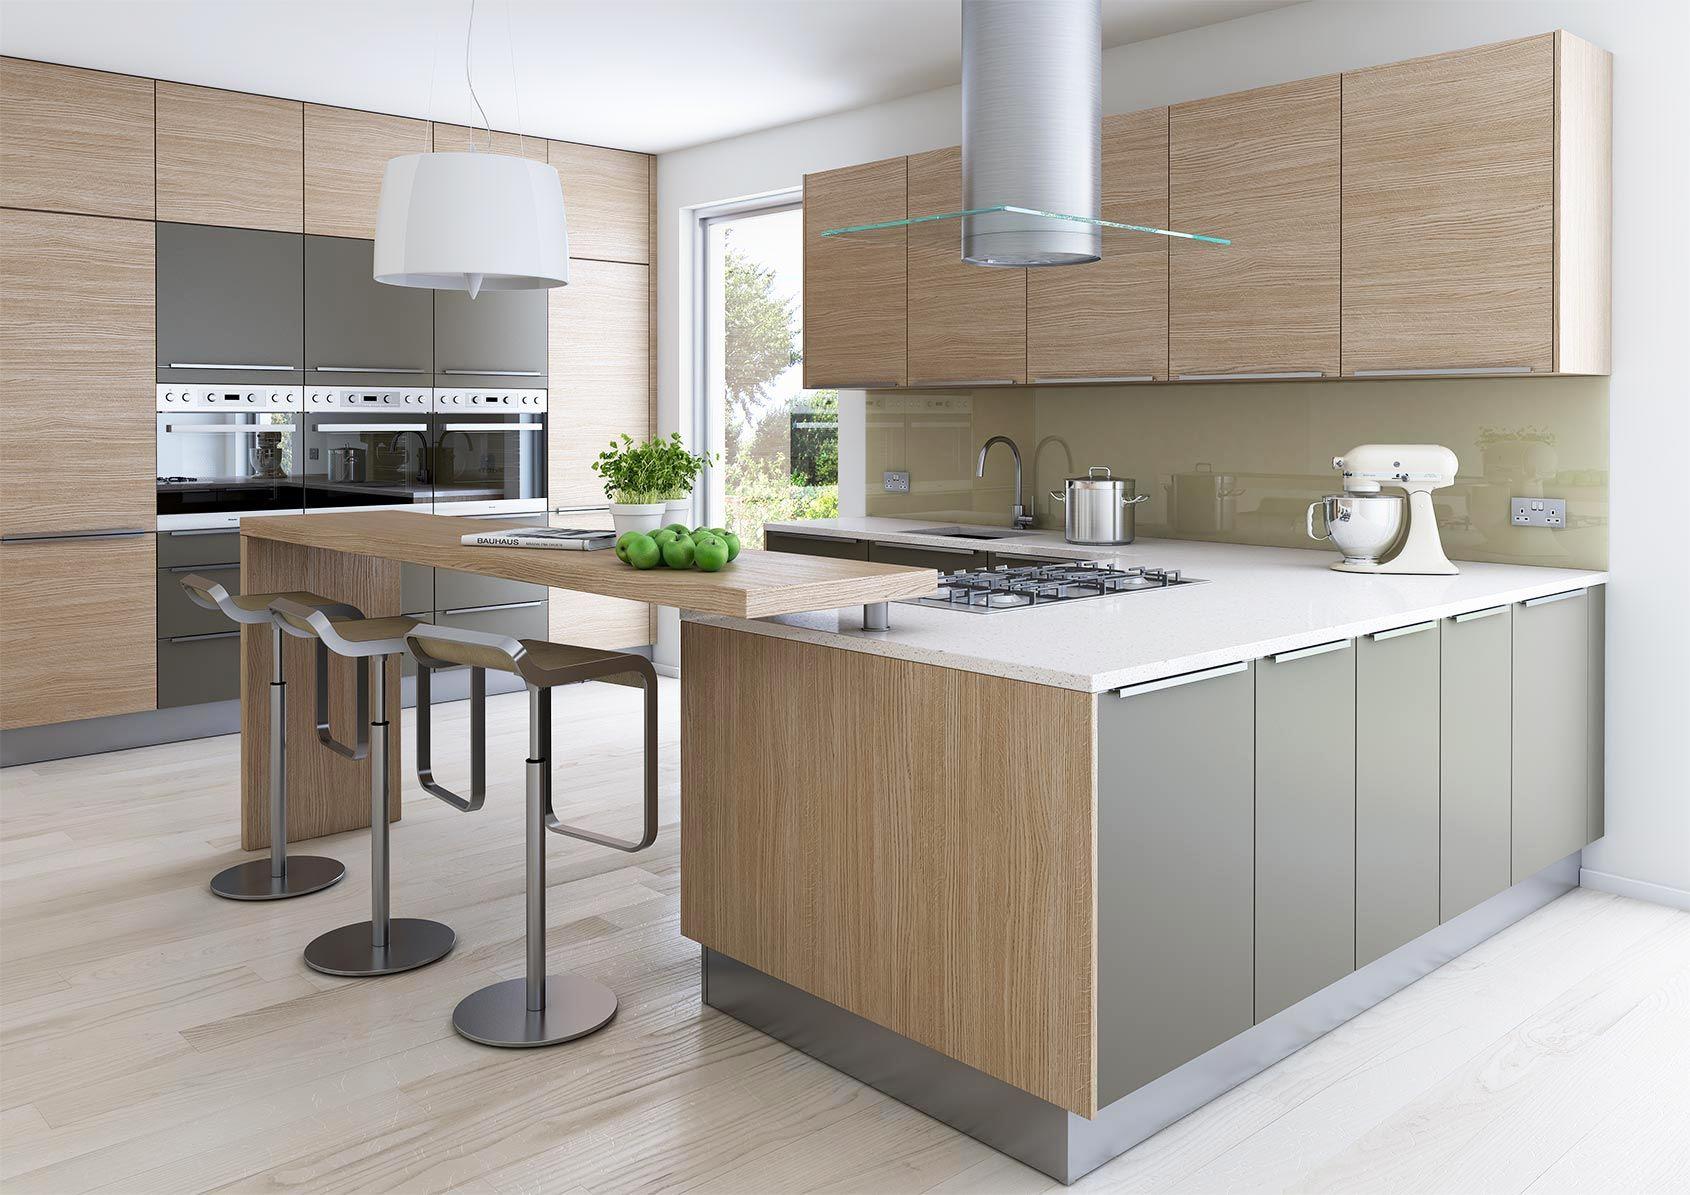 kitchens - Google Search | kitchens | Pinterest | Kitchens, Modern ...